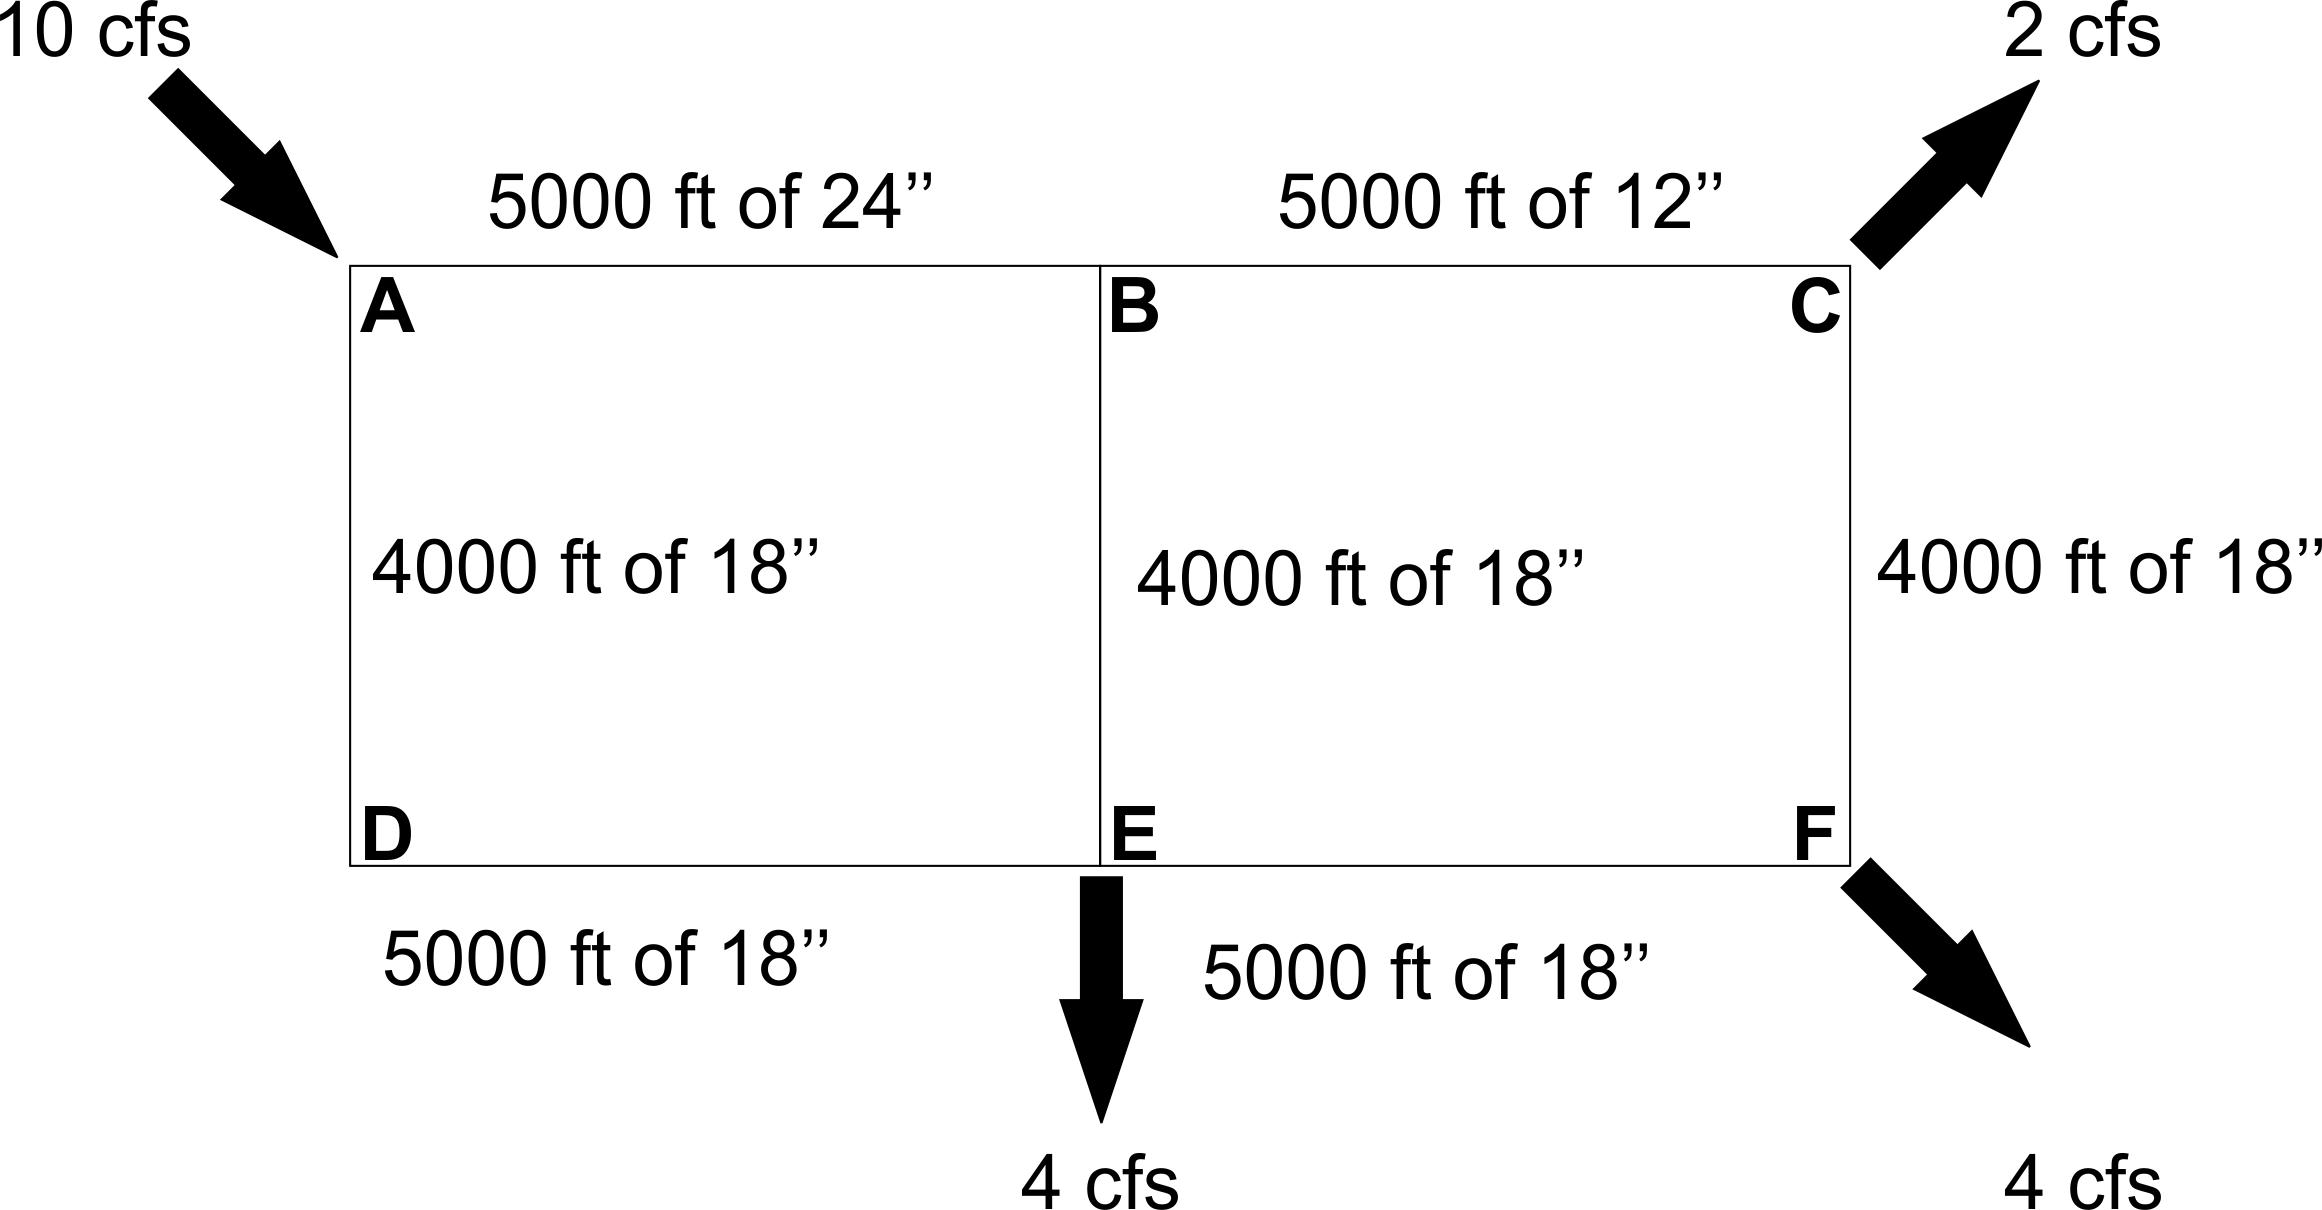 53:071 Principles of Hydraulics & Hydrology (Homework Problem)